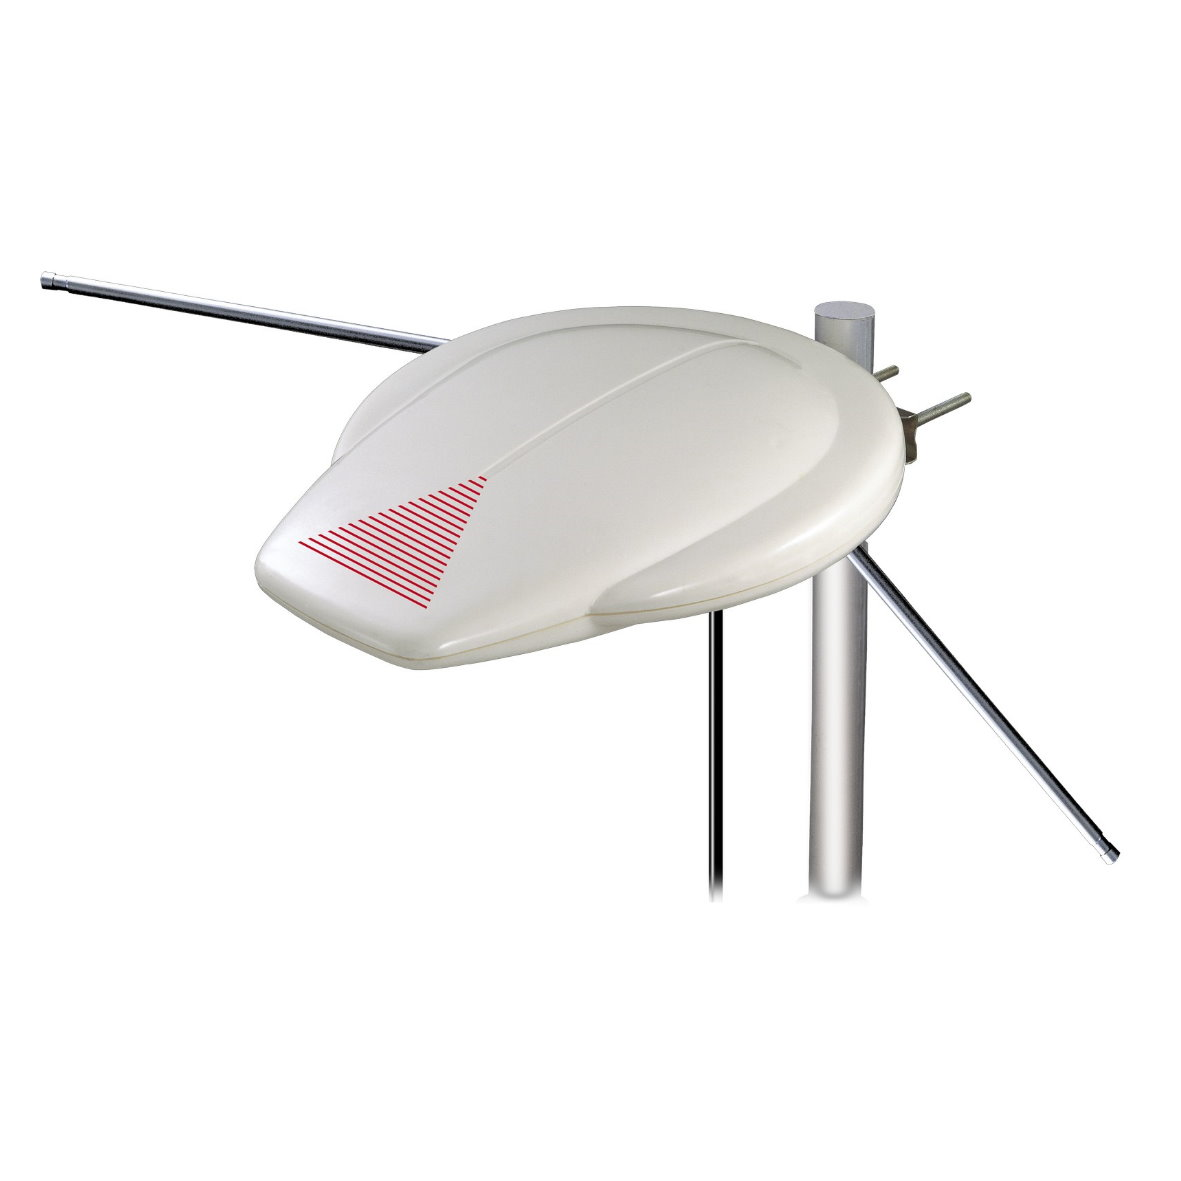 Maximum dvb t antena amplificador interior exterior - Antena exterior tv ...